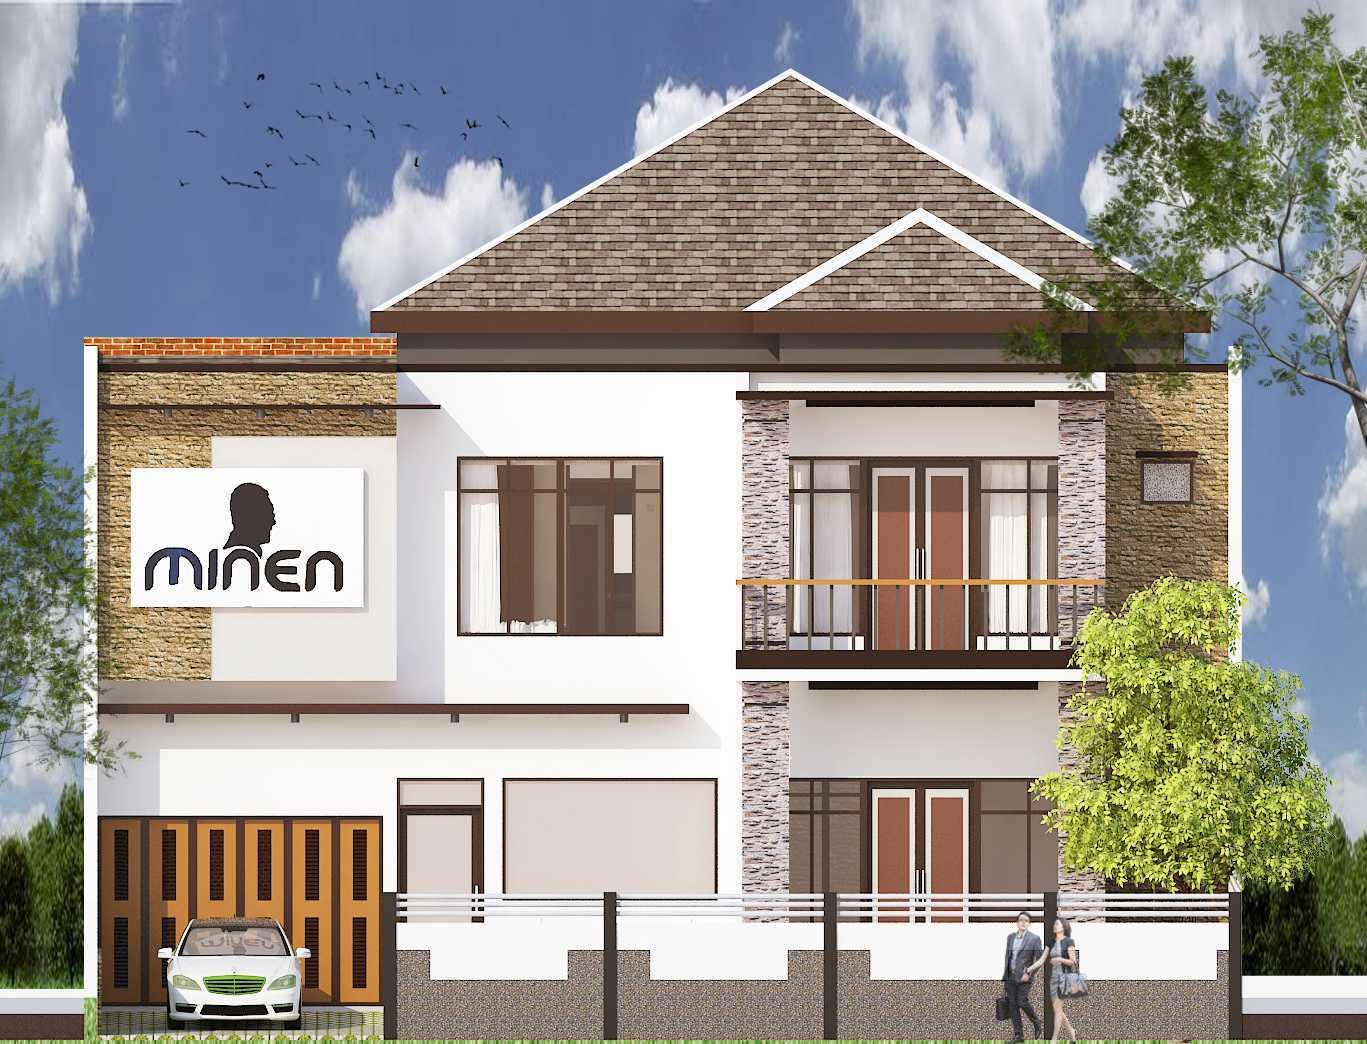 Archdesignbuild7 Rumah Tinggal 2 Lantai ( Minen )  Jl. Alfa Ii, Cigadung, Bandung Jl. Alfa Ii, Cigadung, Bandung Front View Minimalis 20145